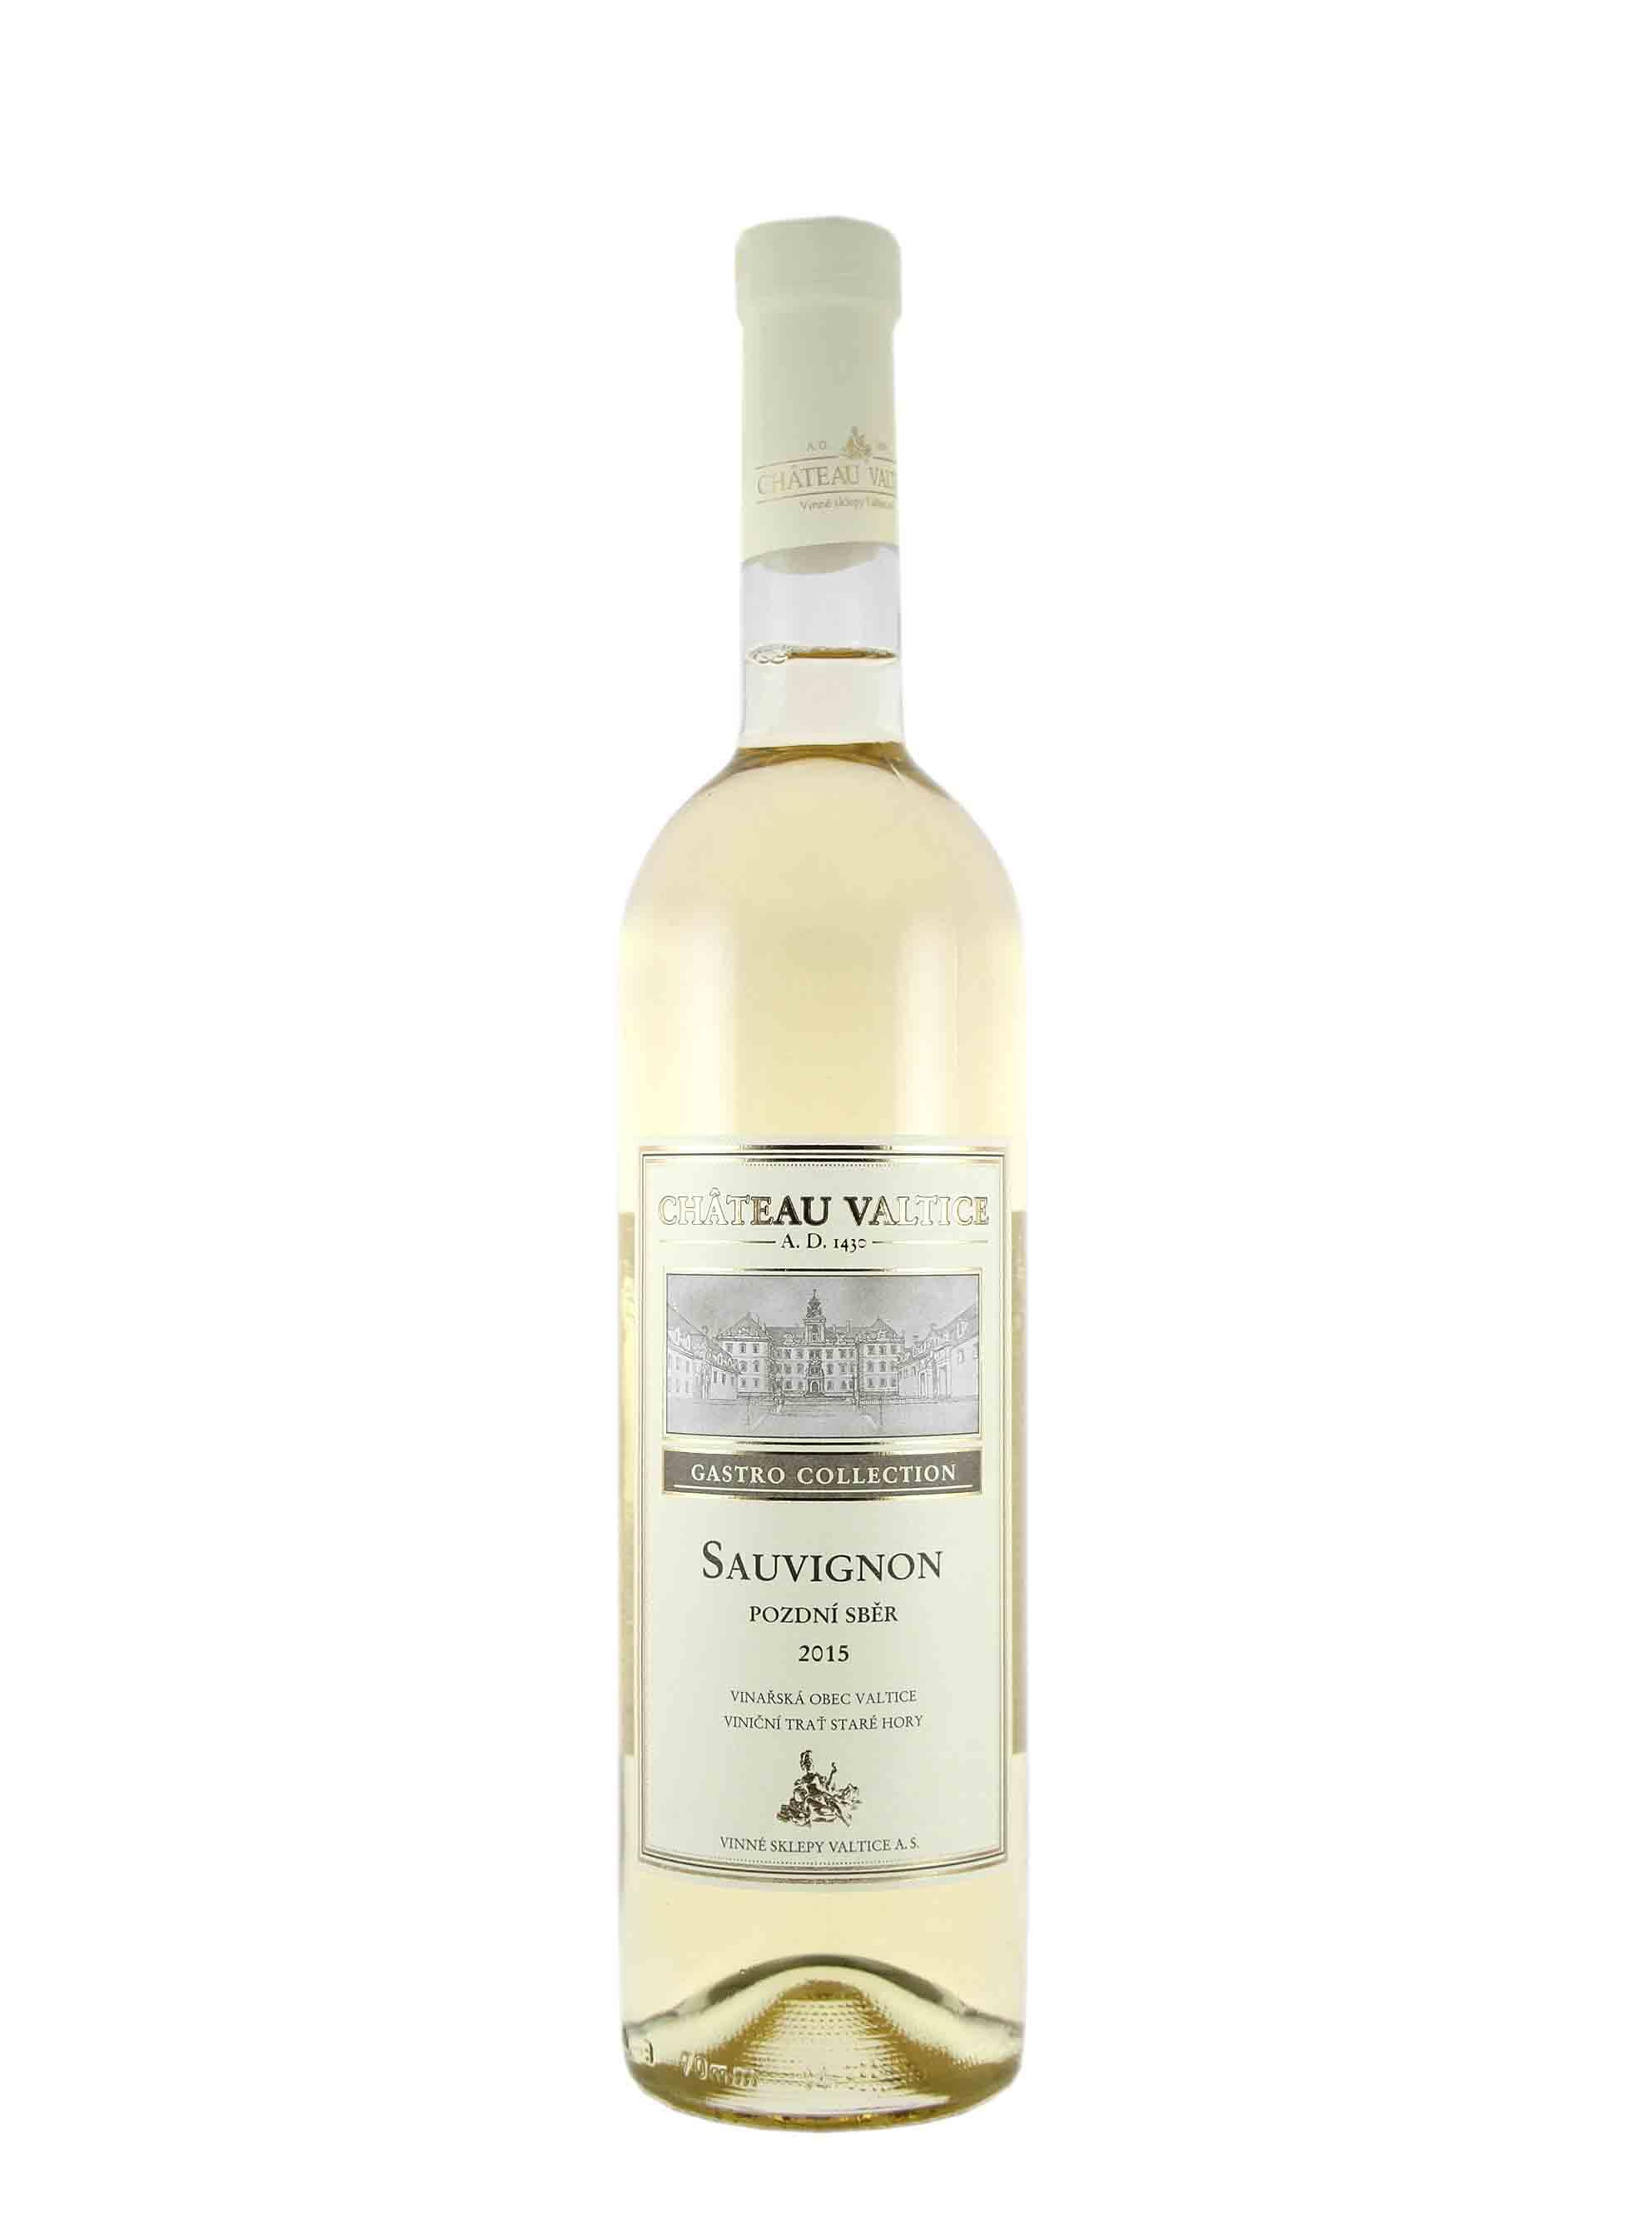 Sauvignon, Gastro Collection, Pozdní sběr, 2015, Château Valtice, 0.75 l